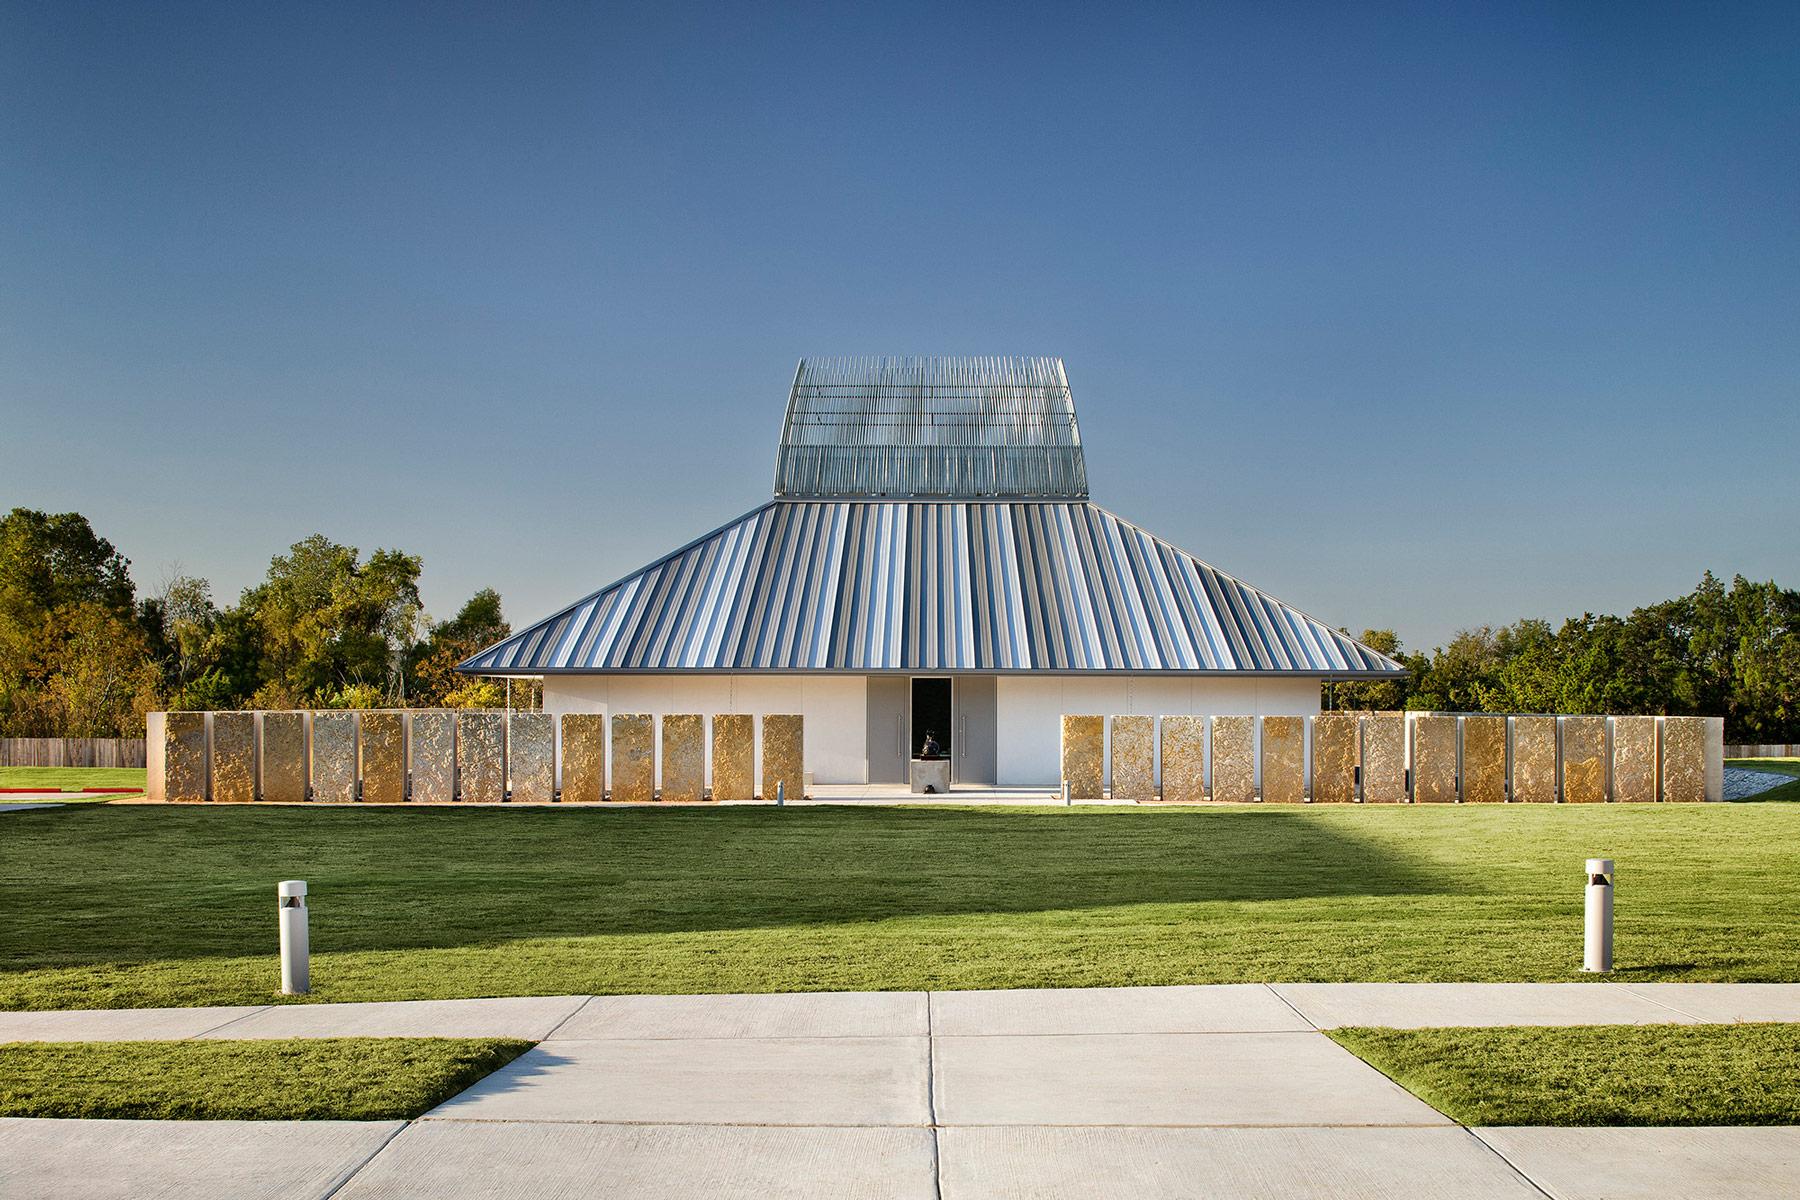 Mir rivera talks about the symbiotic architect engineer - Interior design jobs in austin tx ...